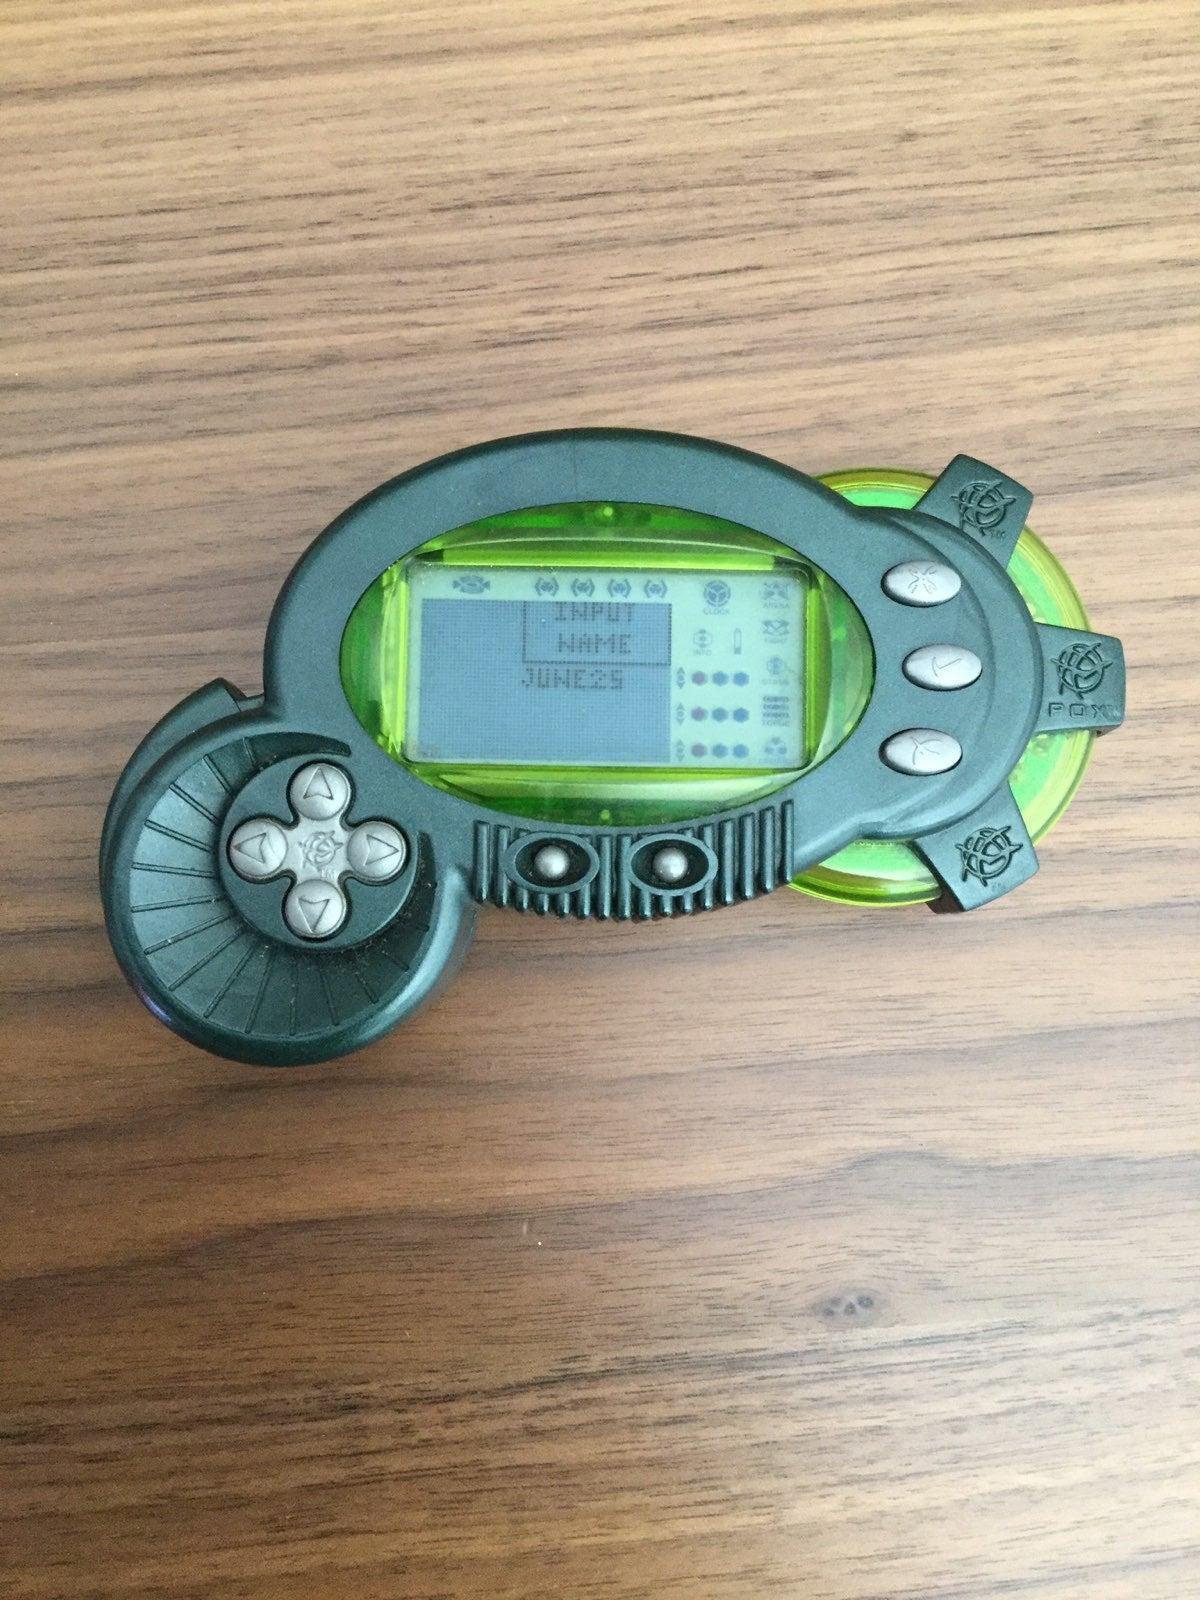 2001 POX Cycro Alien Creation Handheld